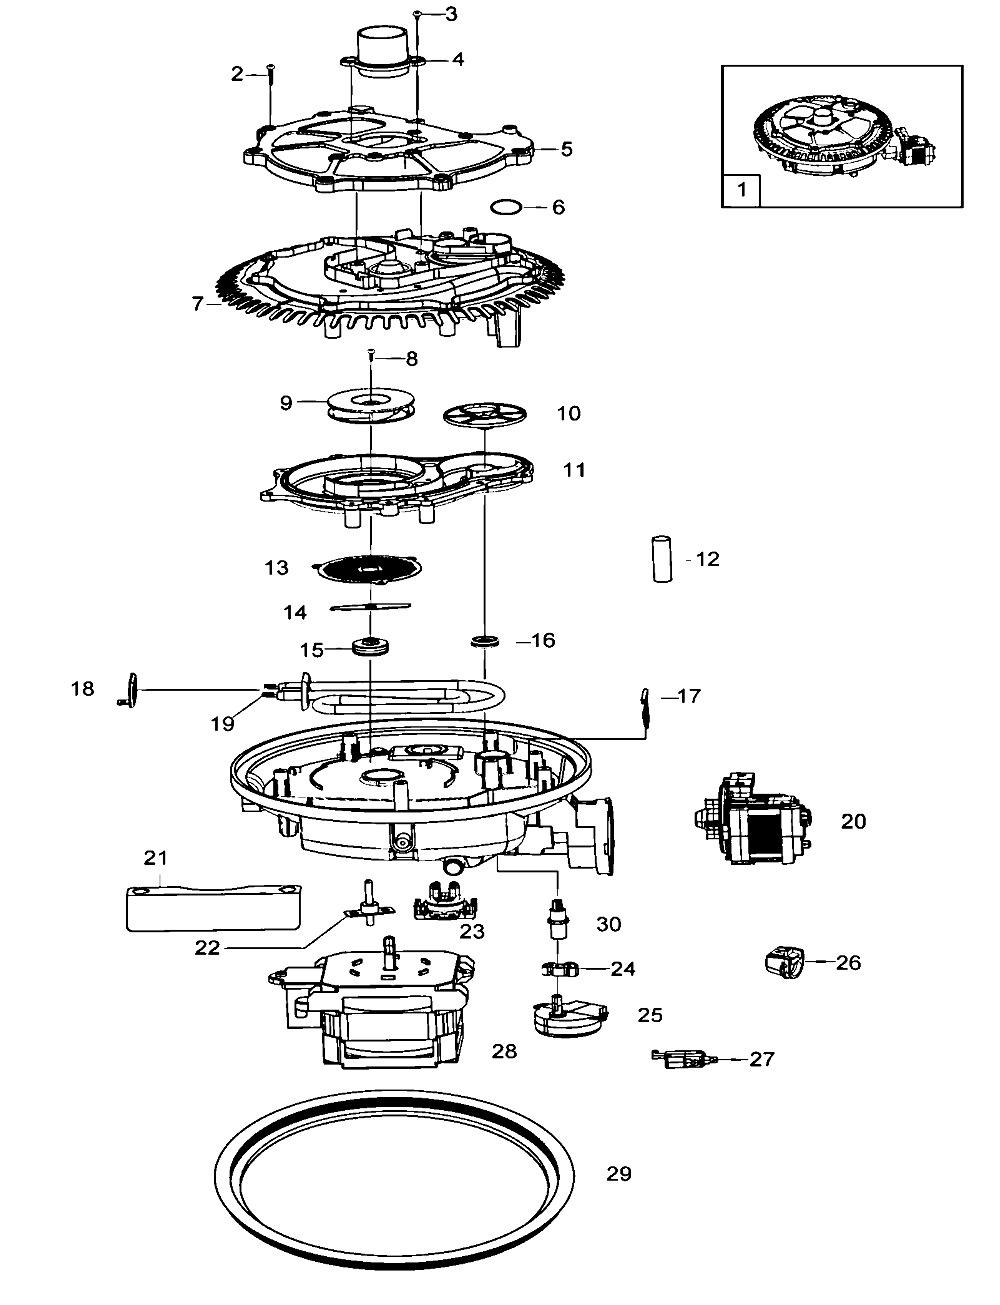 Modern Energy Star Dishwashers and Pump Horsepower